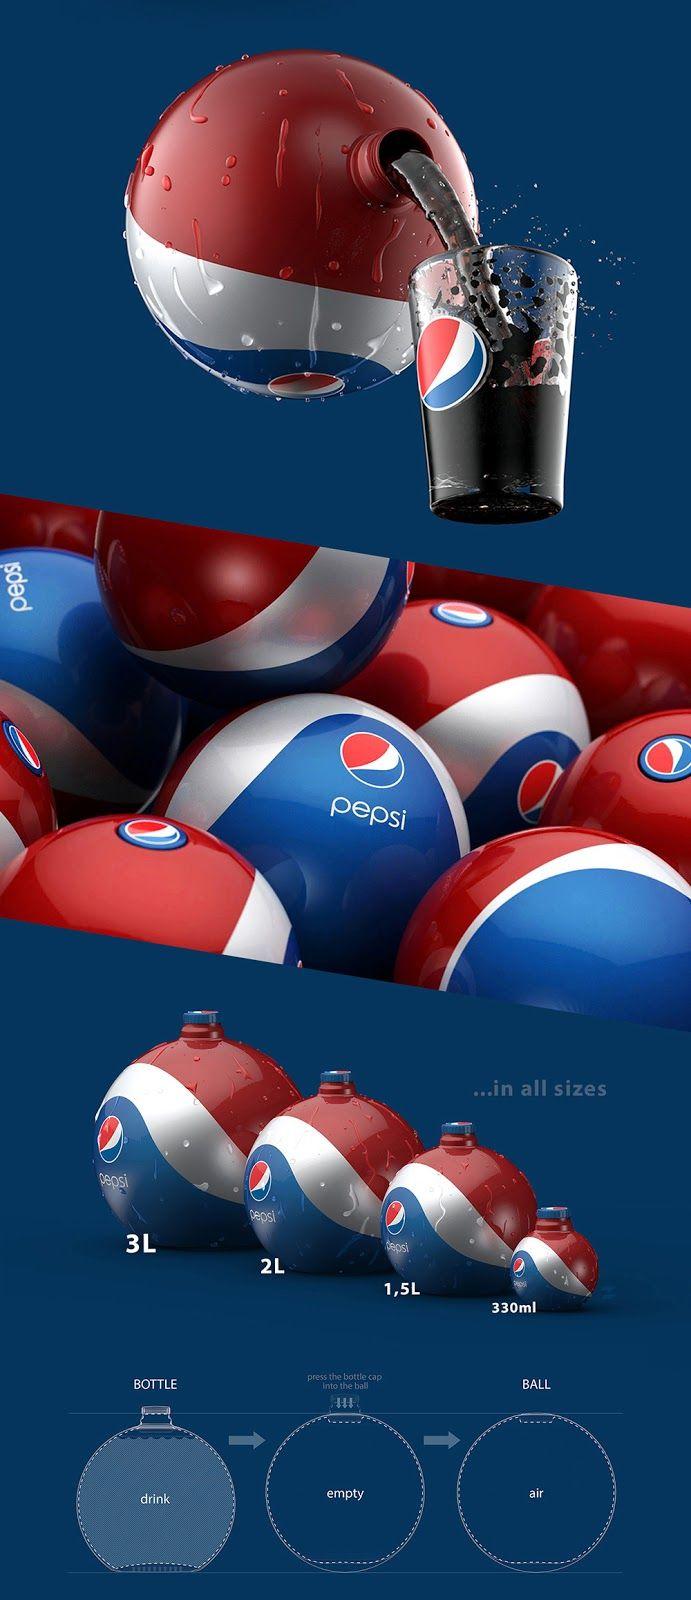 bouteille-ballon-pepsi-4